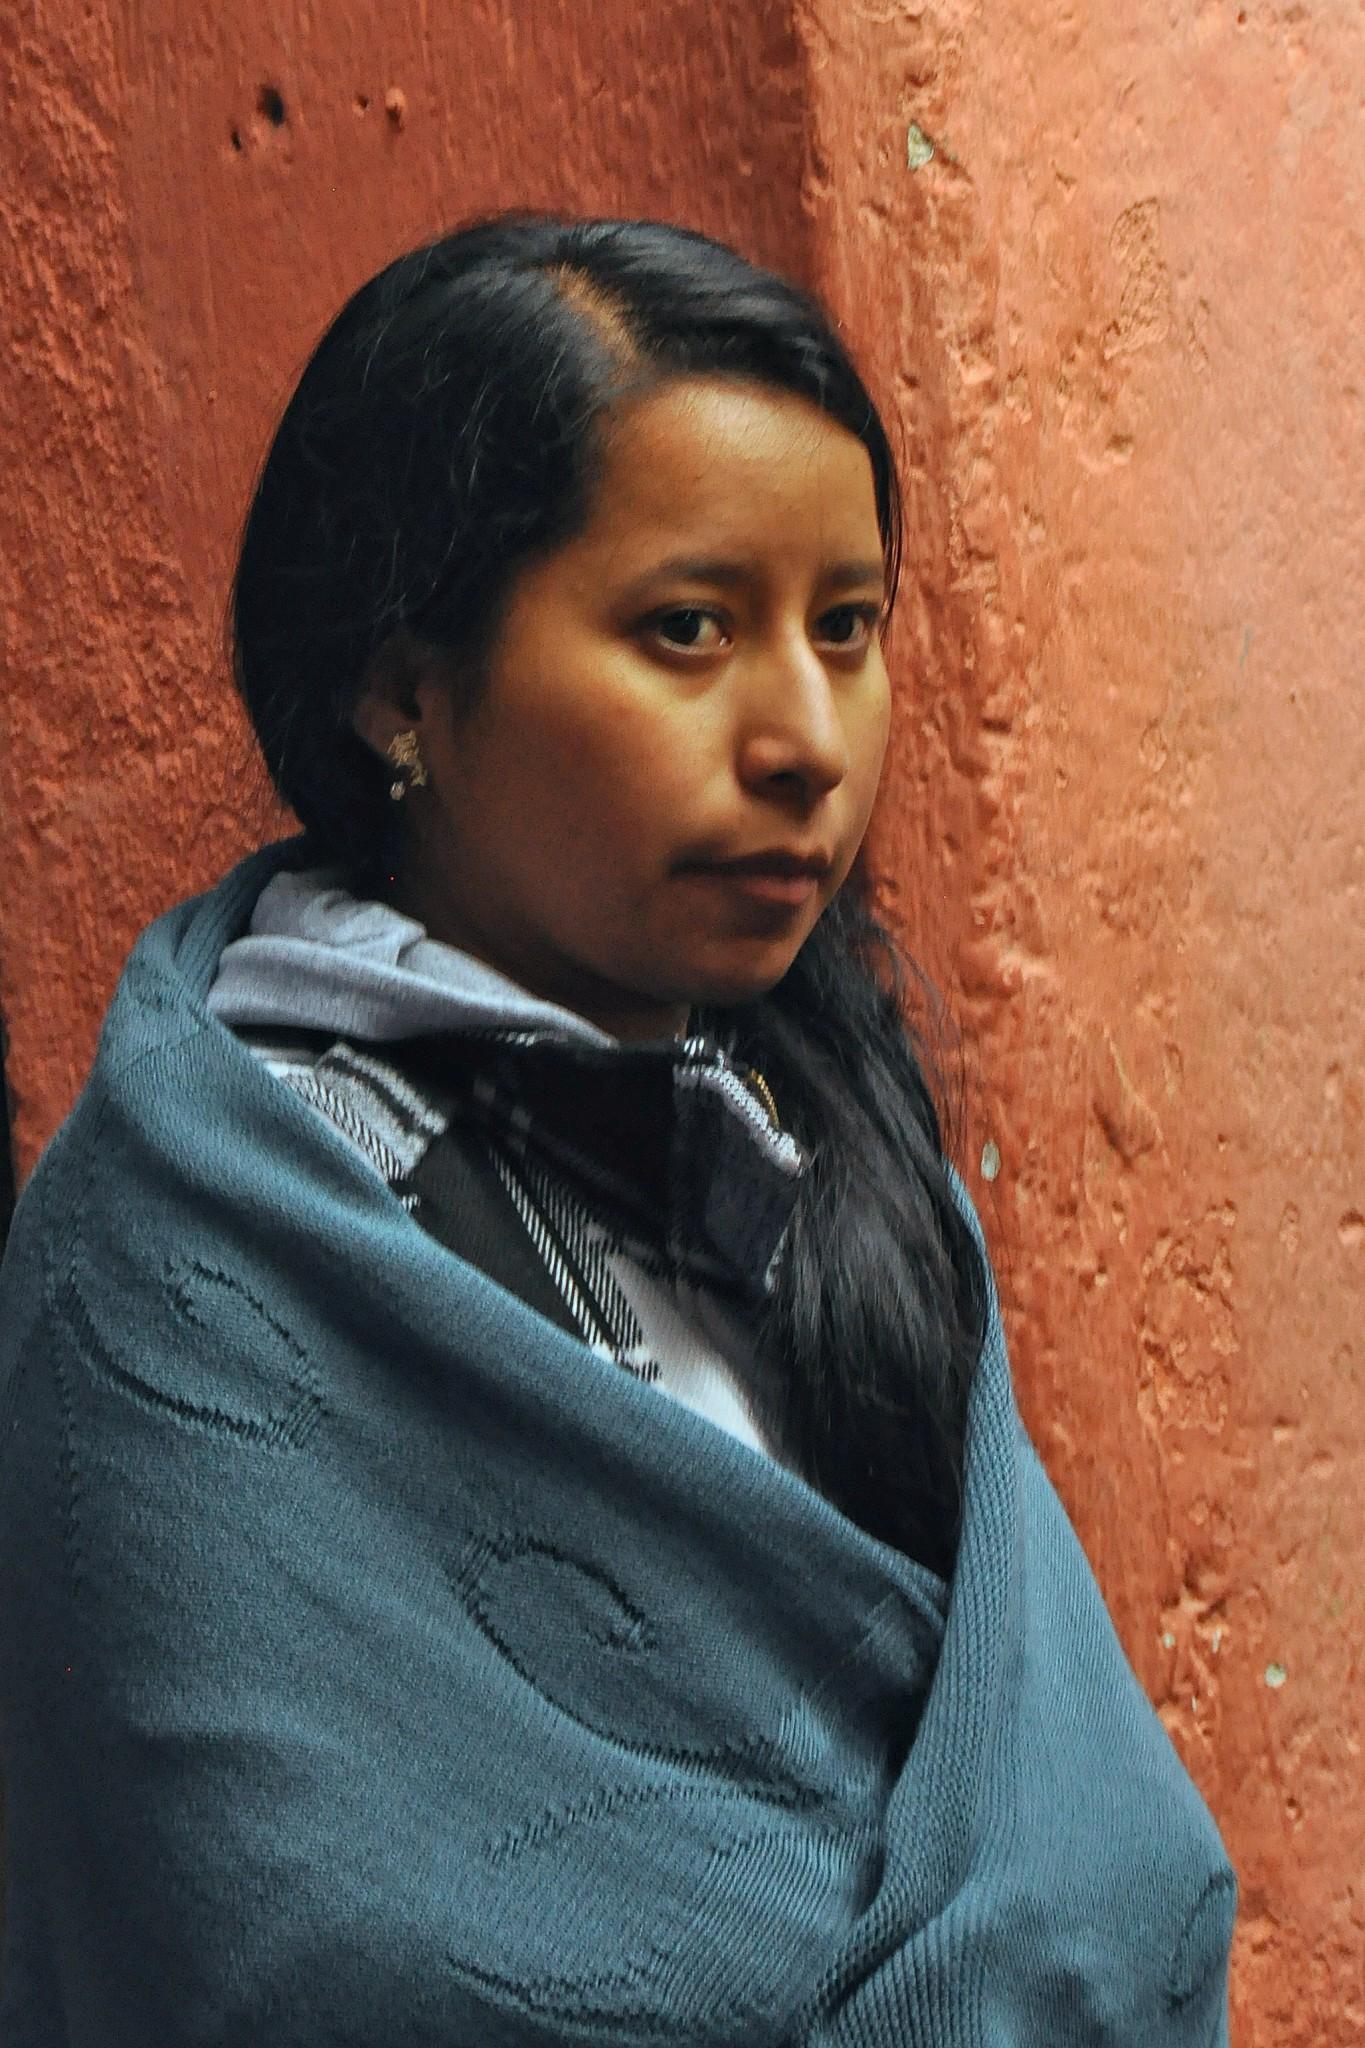 Beautiful Guatemalan girl